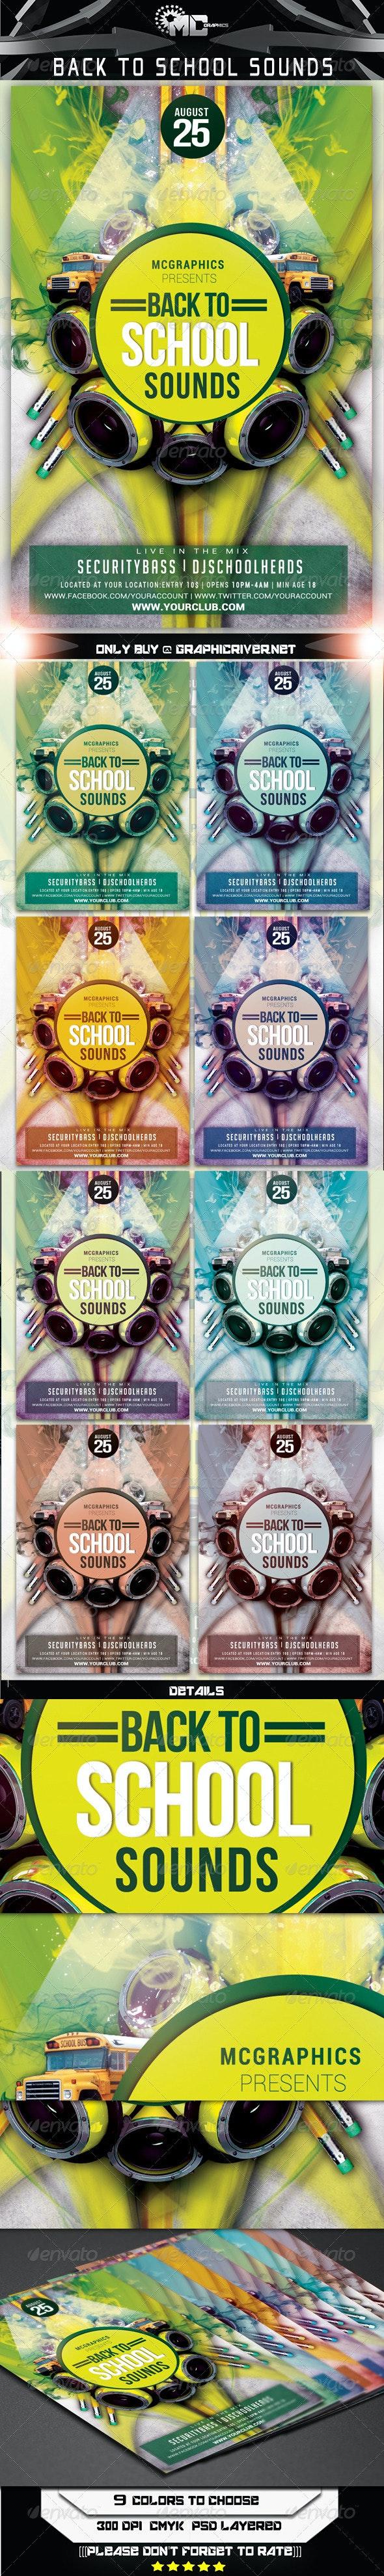 Back 2 School Sounds Flyer Template - Flyers Print Templates